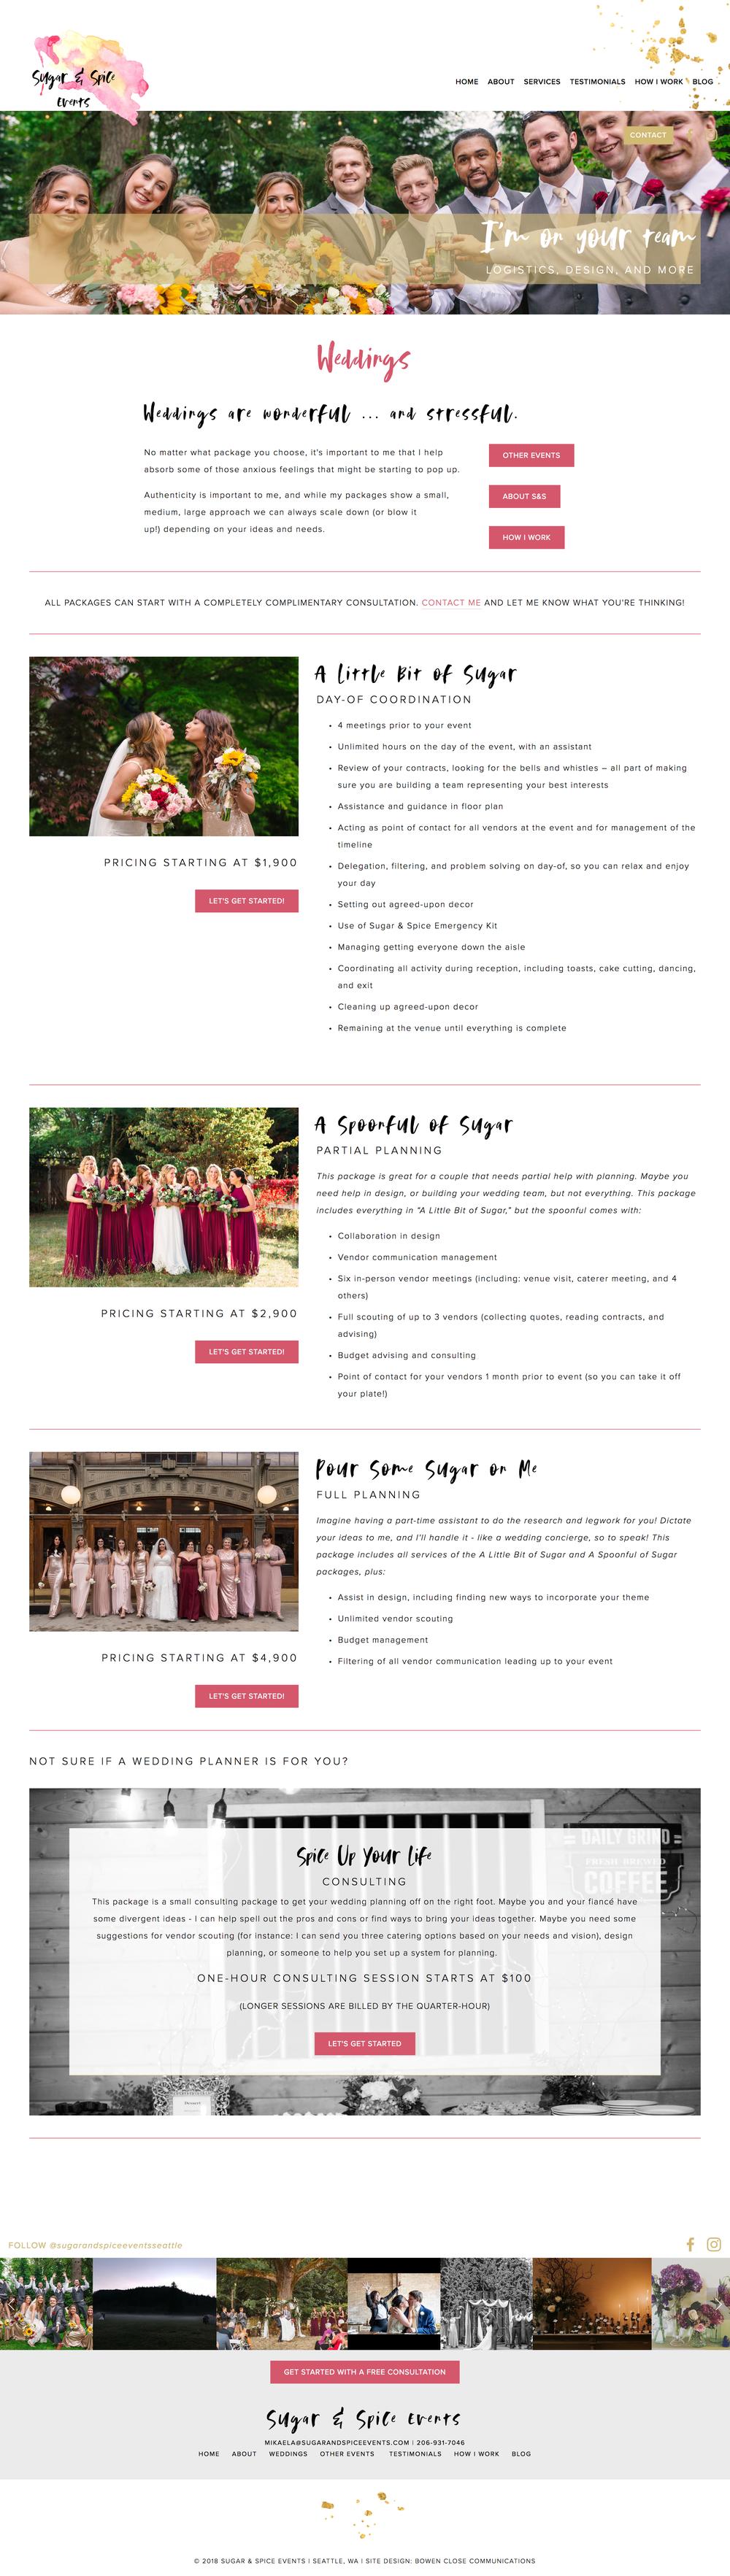 Sugar & Spice - Weddings.png